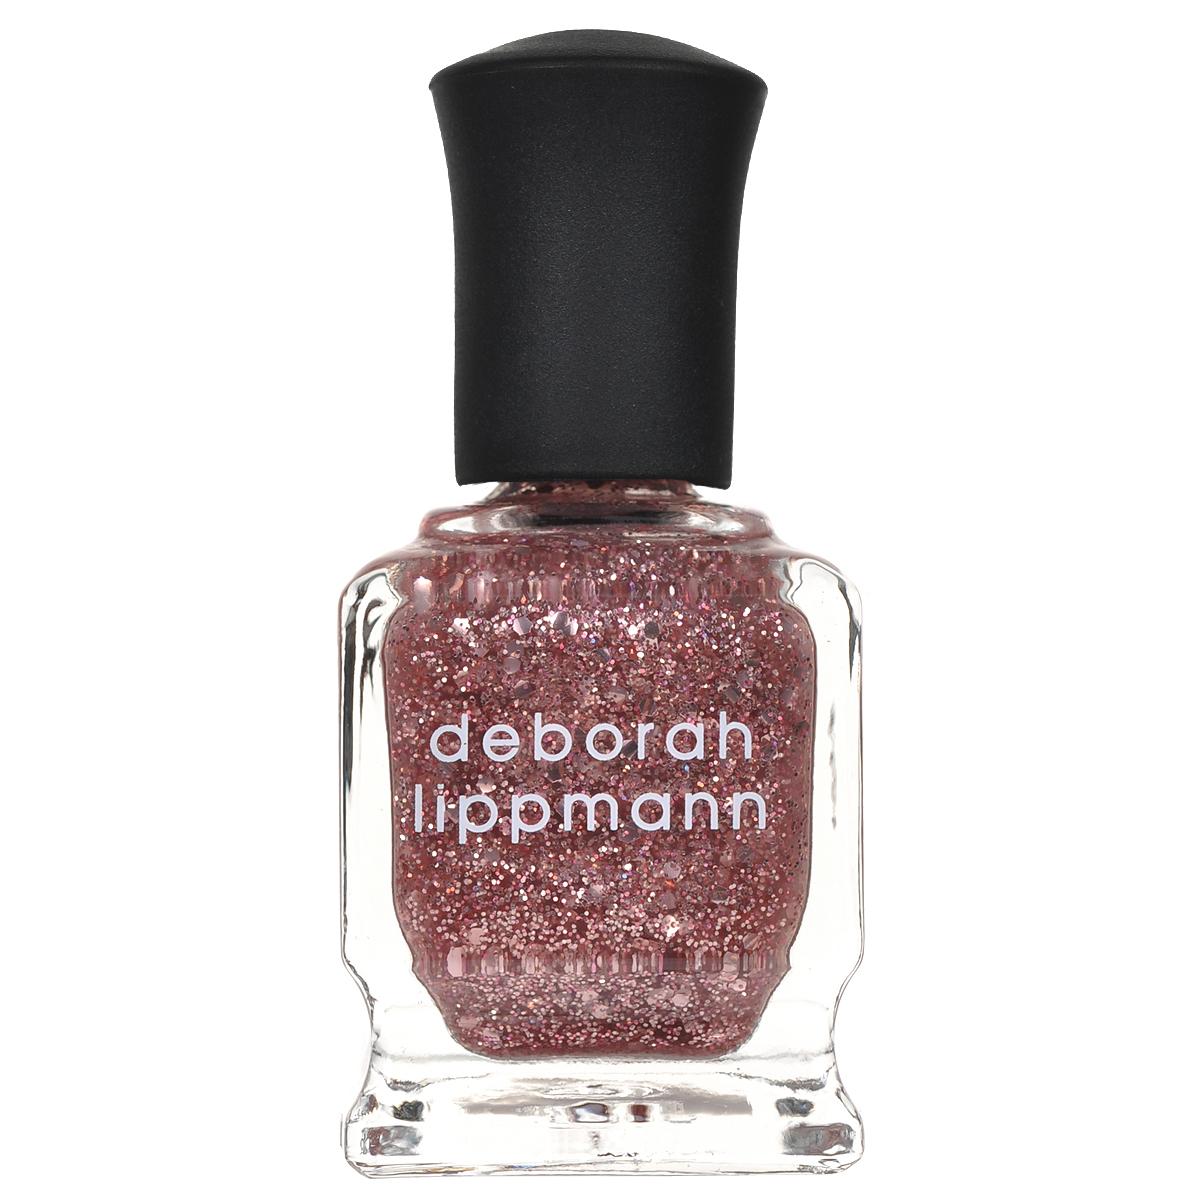 Deborah Lippmann Лак для ногтей Some Enchanted Evening, 15 мл